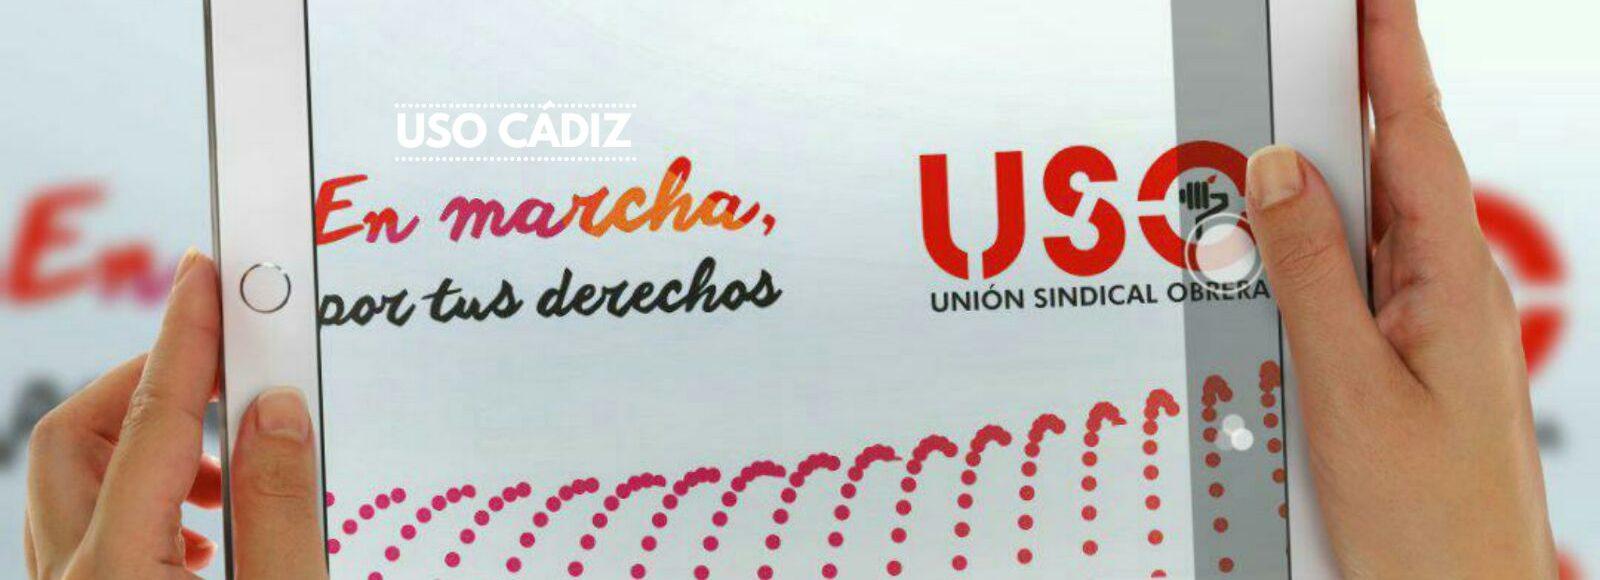 USO Cádiz